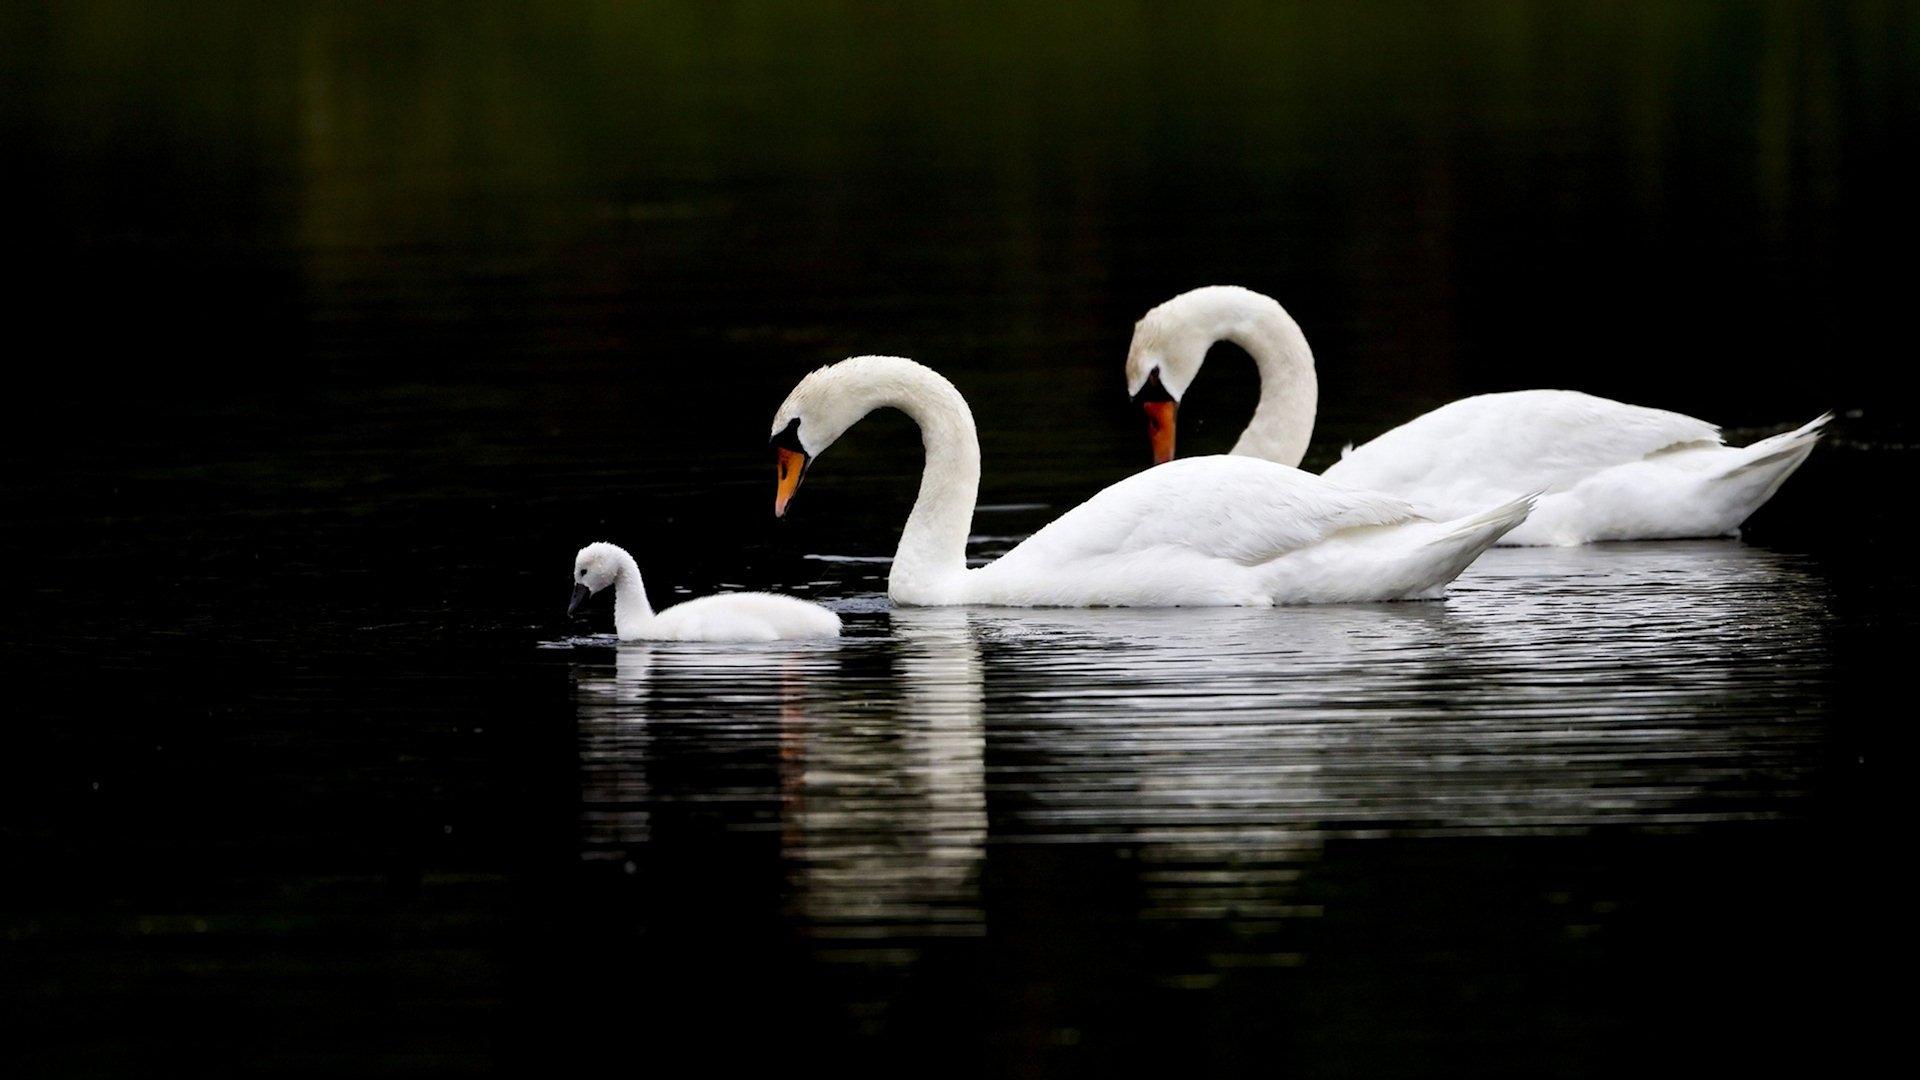 White Swan Wallpaper